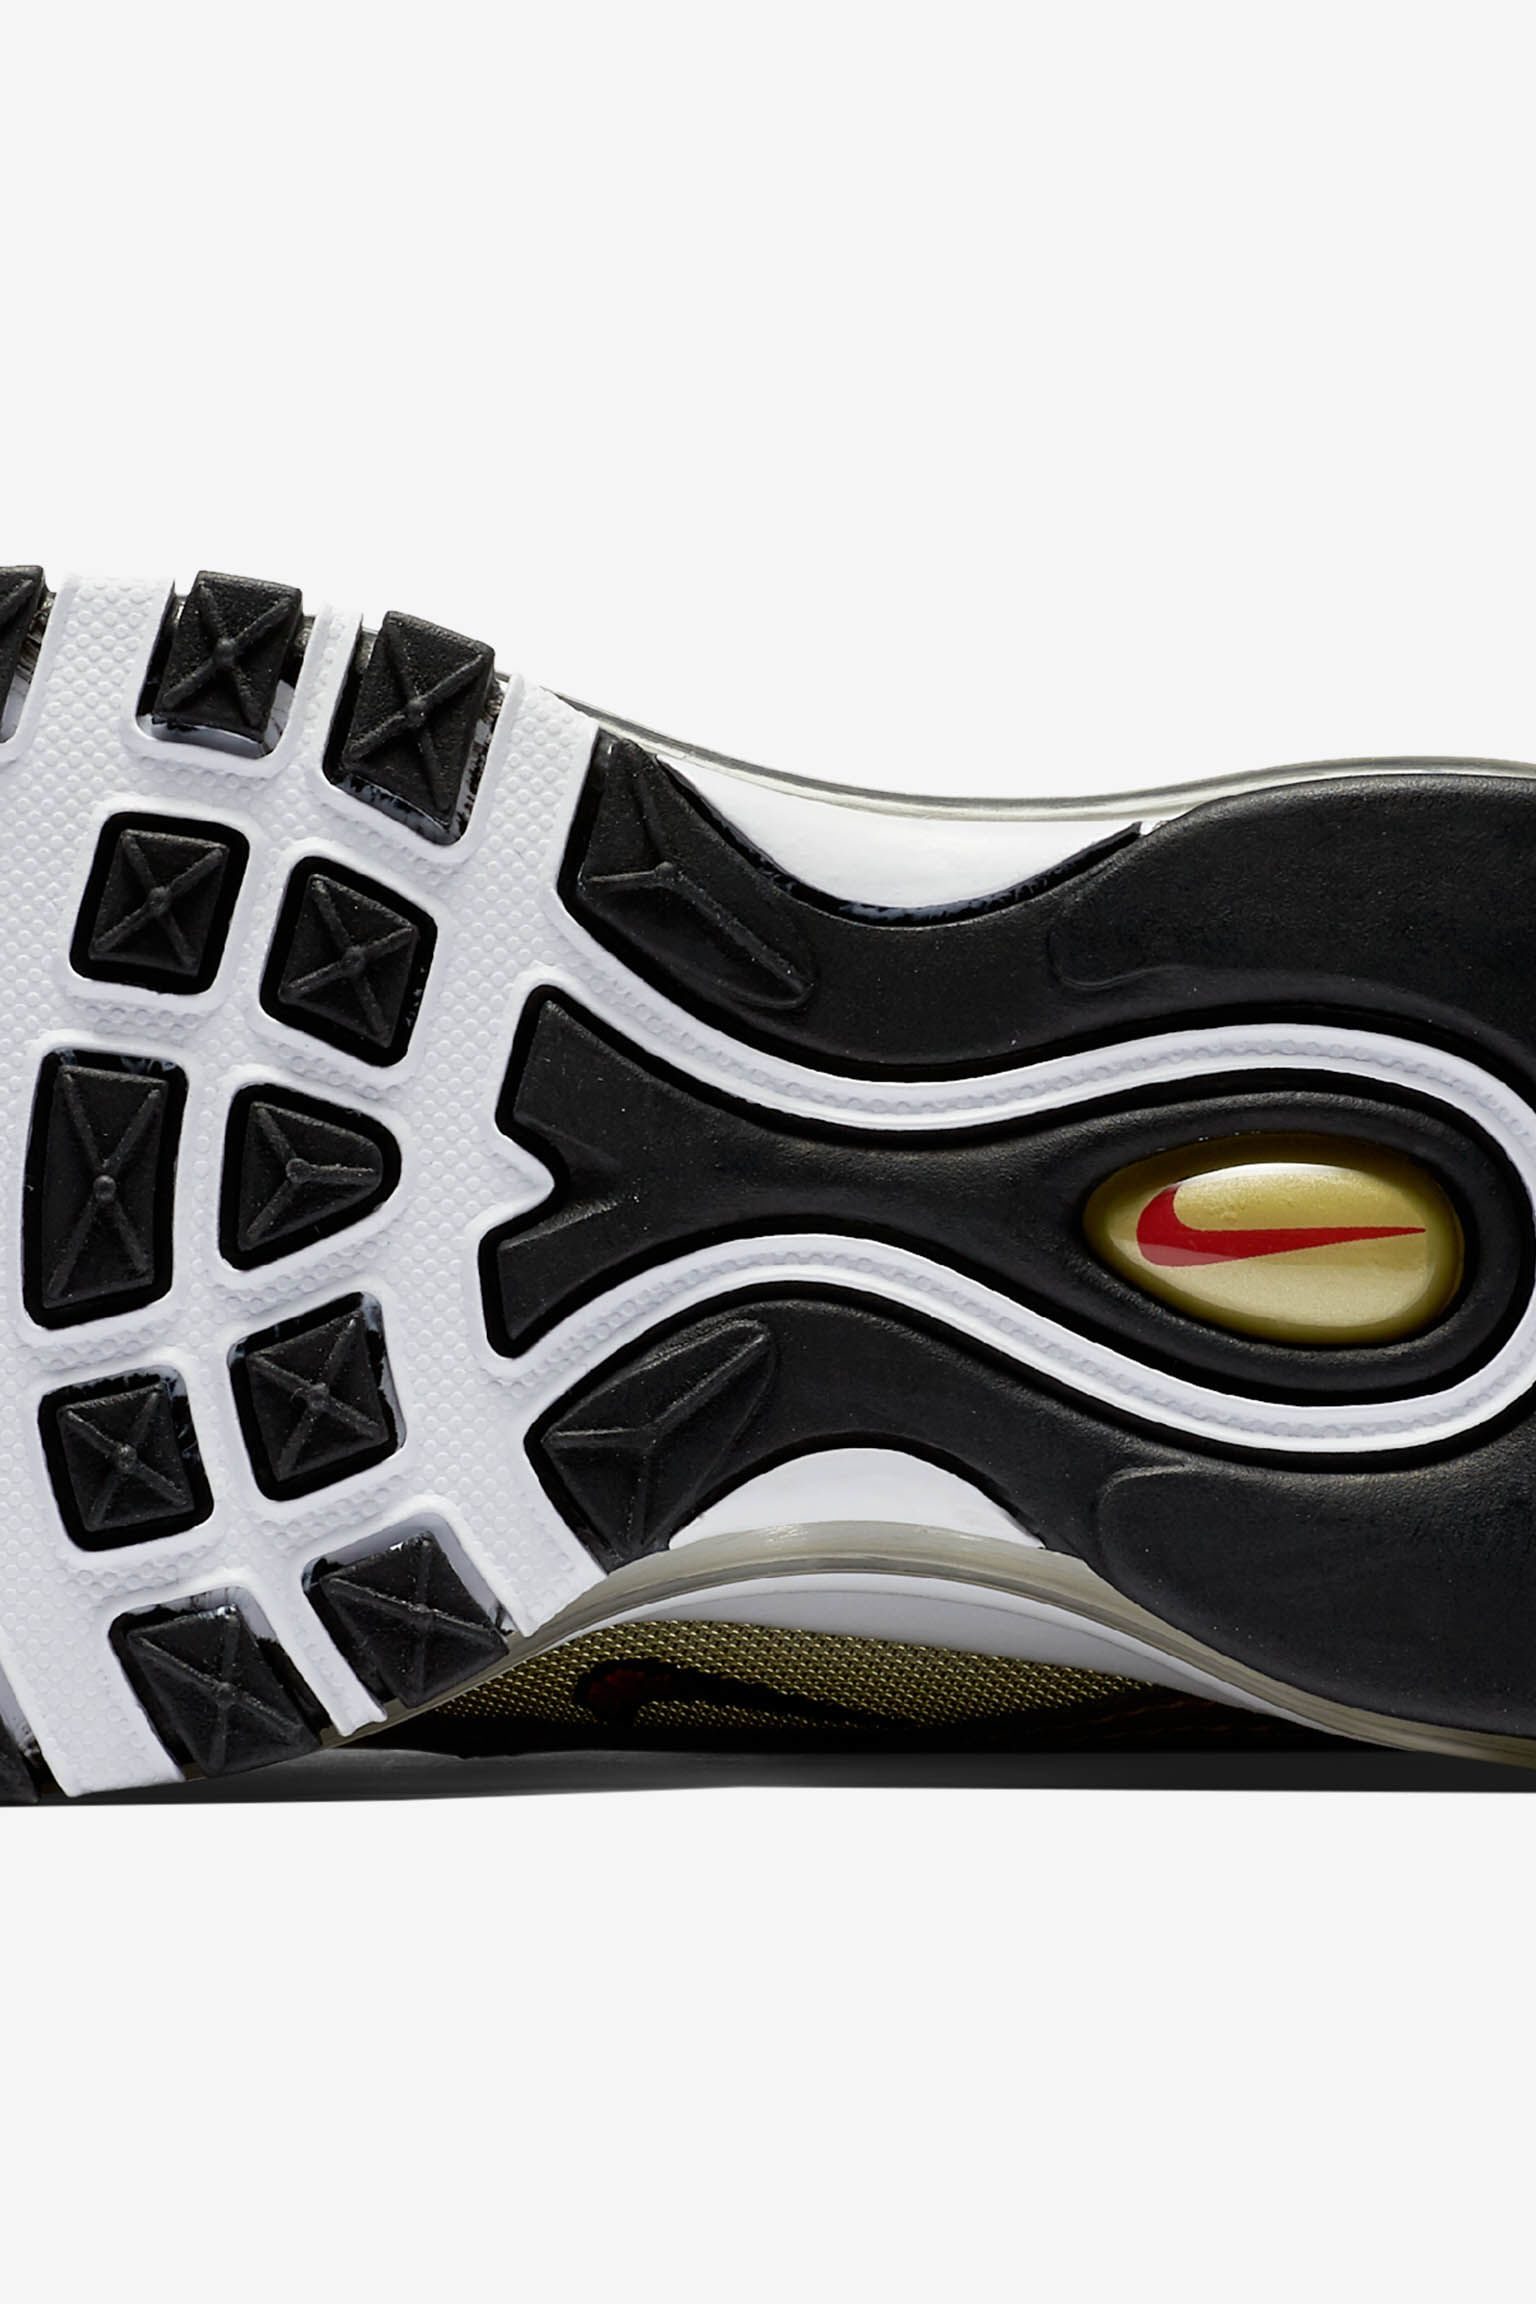 Women's Nike Air Max 97 OG QS 'Metallic Gold' Release Date